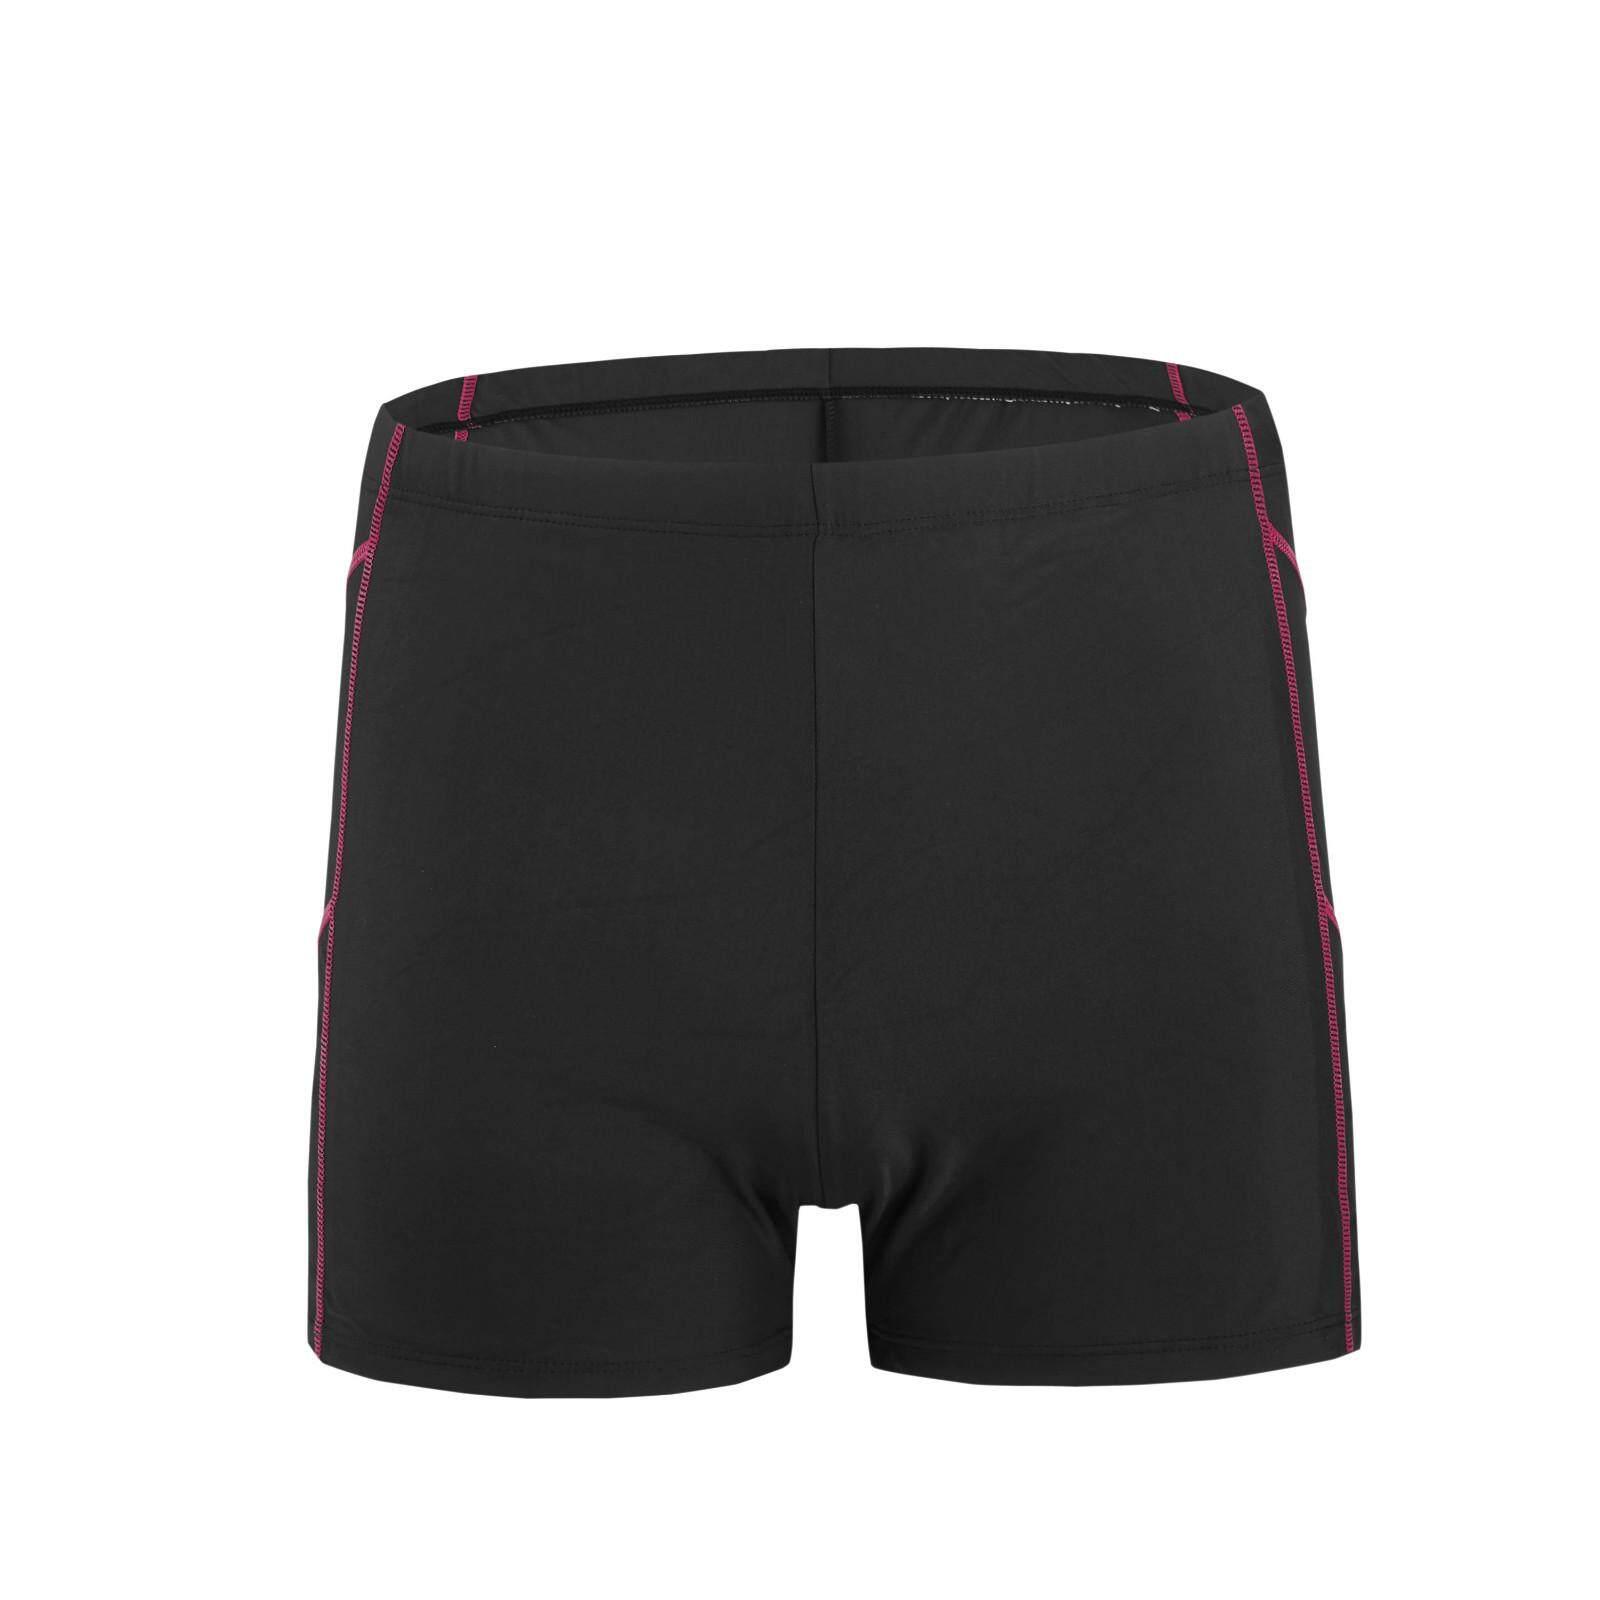 80ac3245677b5 Watsonshop Men Summer Trunks Quick Dry Swimwear Beach Surfing Running  Swimming Short Pants hot sale